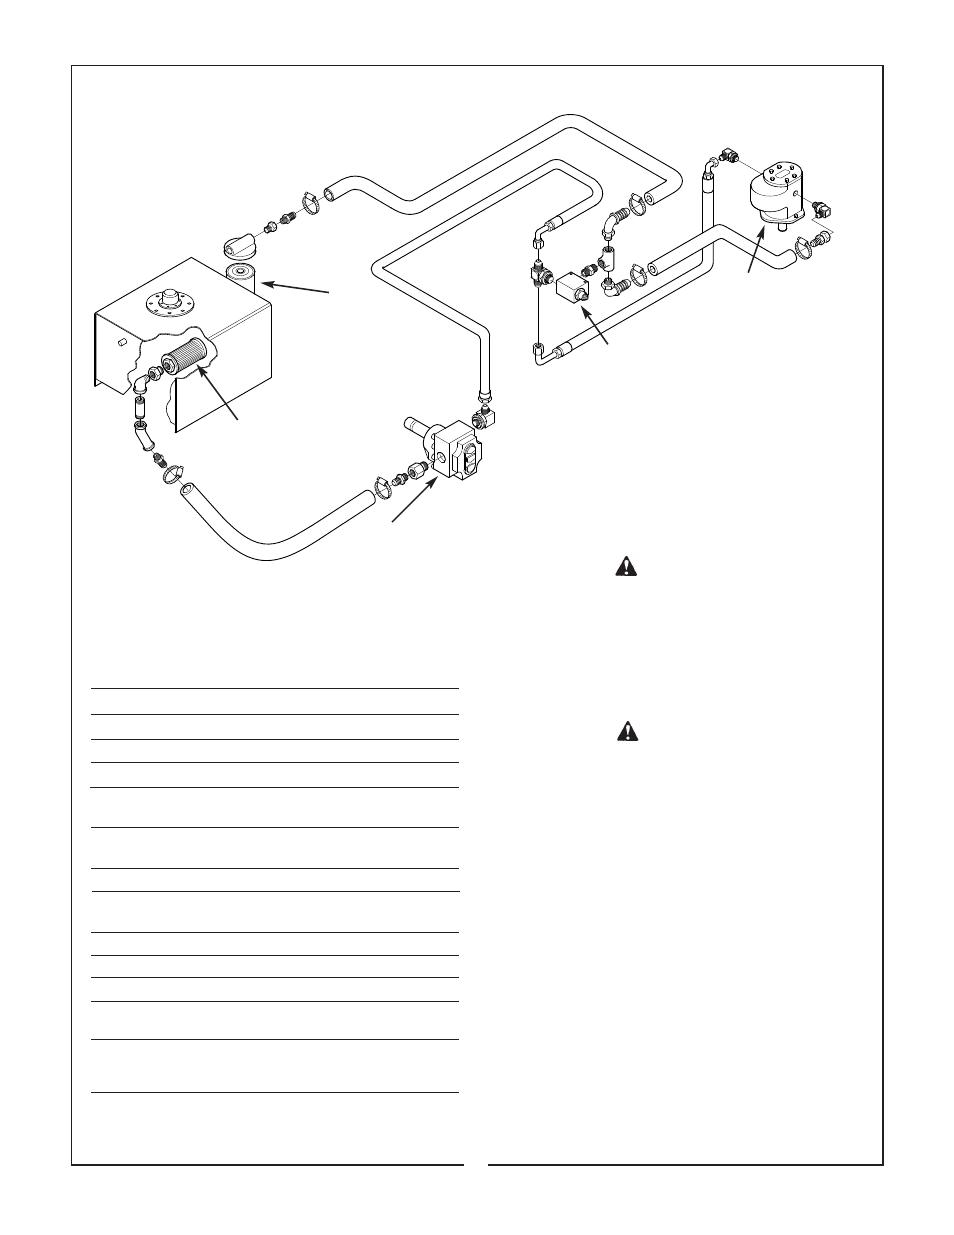 Preparation for use | Bush Hog SM 60 User Manual | Page 10 / 26